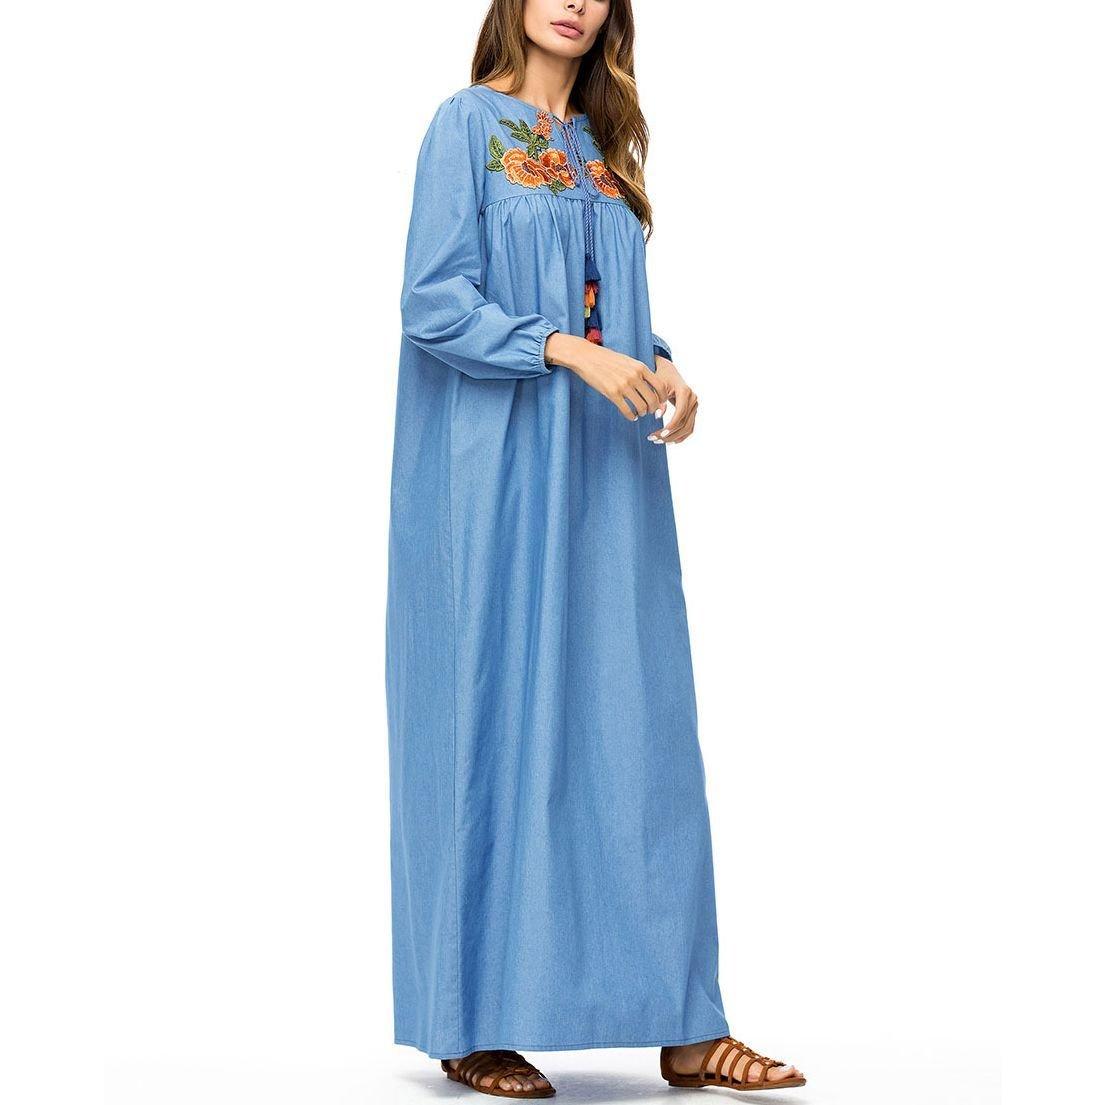 Loose Denim Casual Dress in Maxi Length